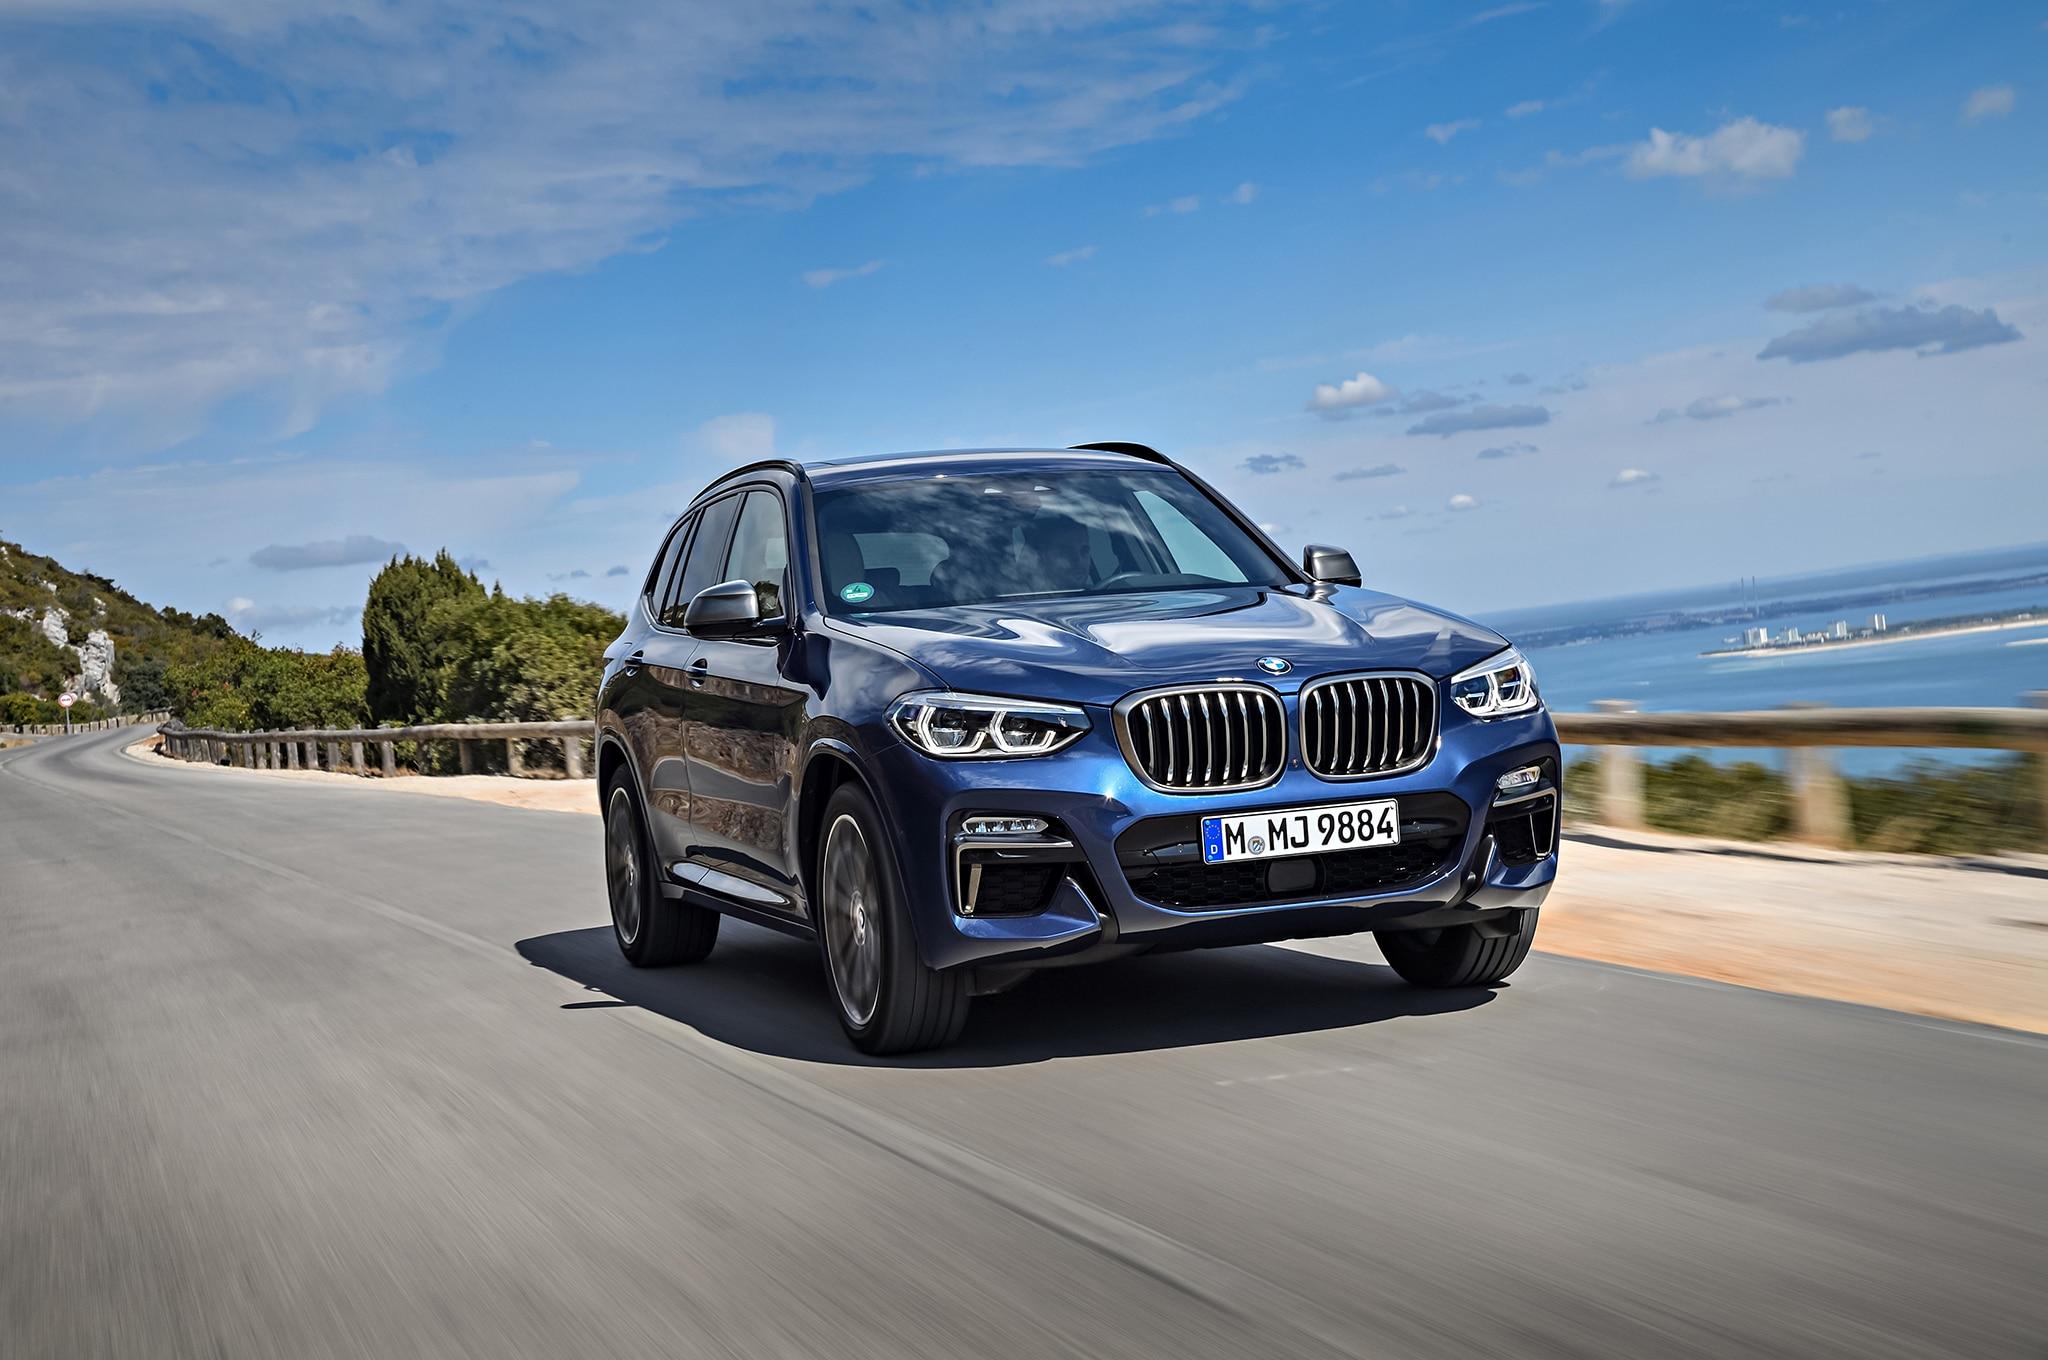 2018 BMW X3 M40i Front Three Quarter In Motion 40